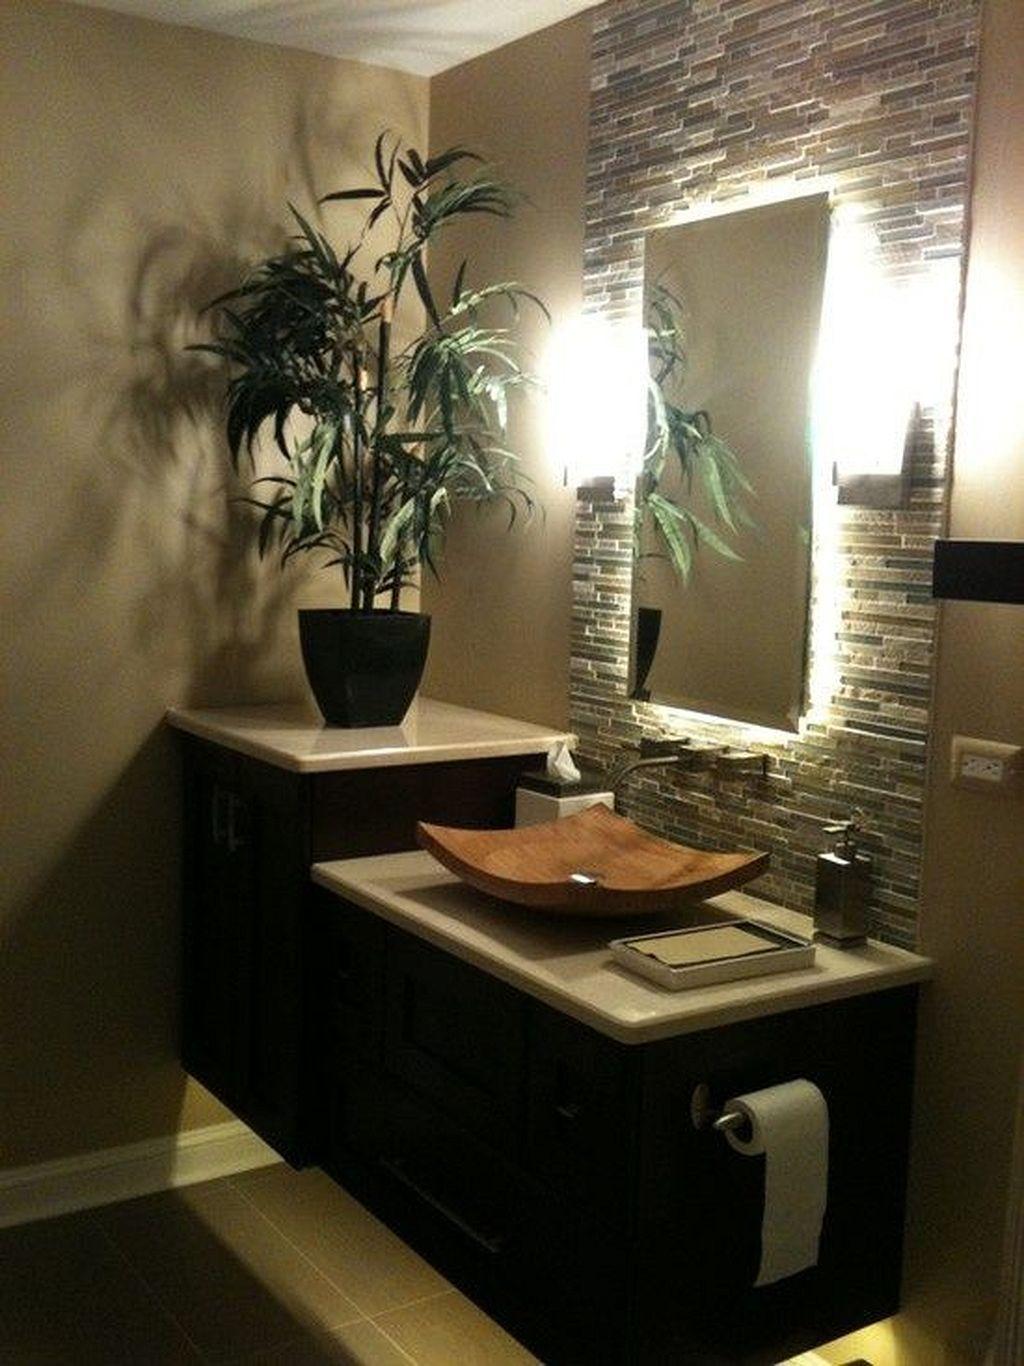 Cool 30 Tropical Bathroom Decor Https Kidmagz Com 30 Tropical Bathroom Decor Tropical Bathroom Decor Bathroom Themes Spa Decor